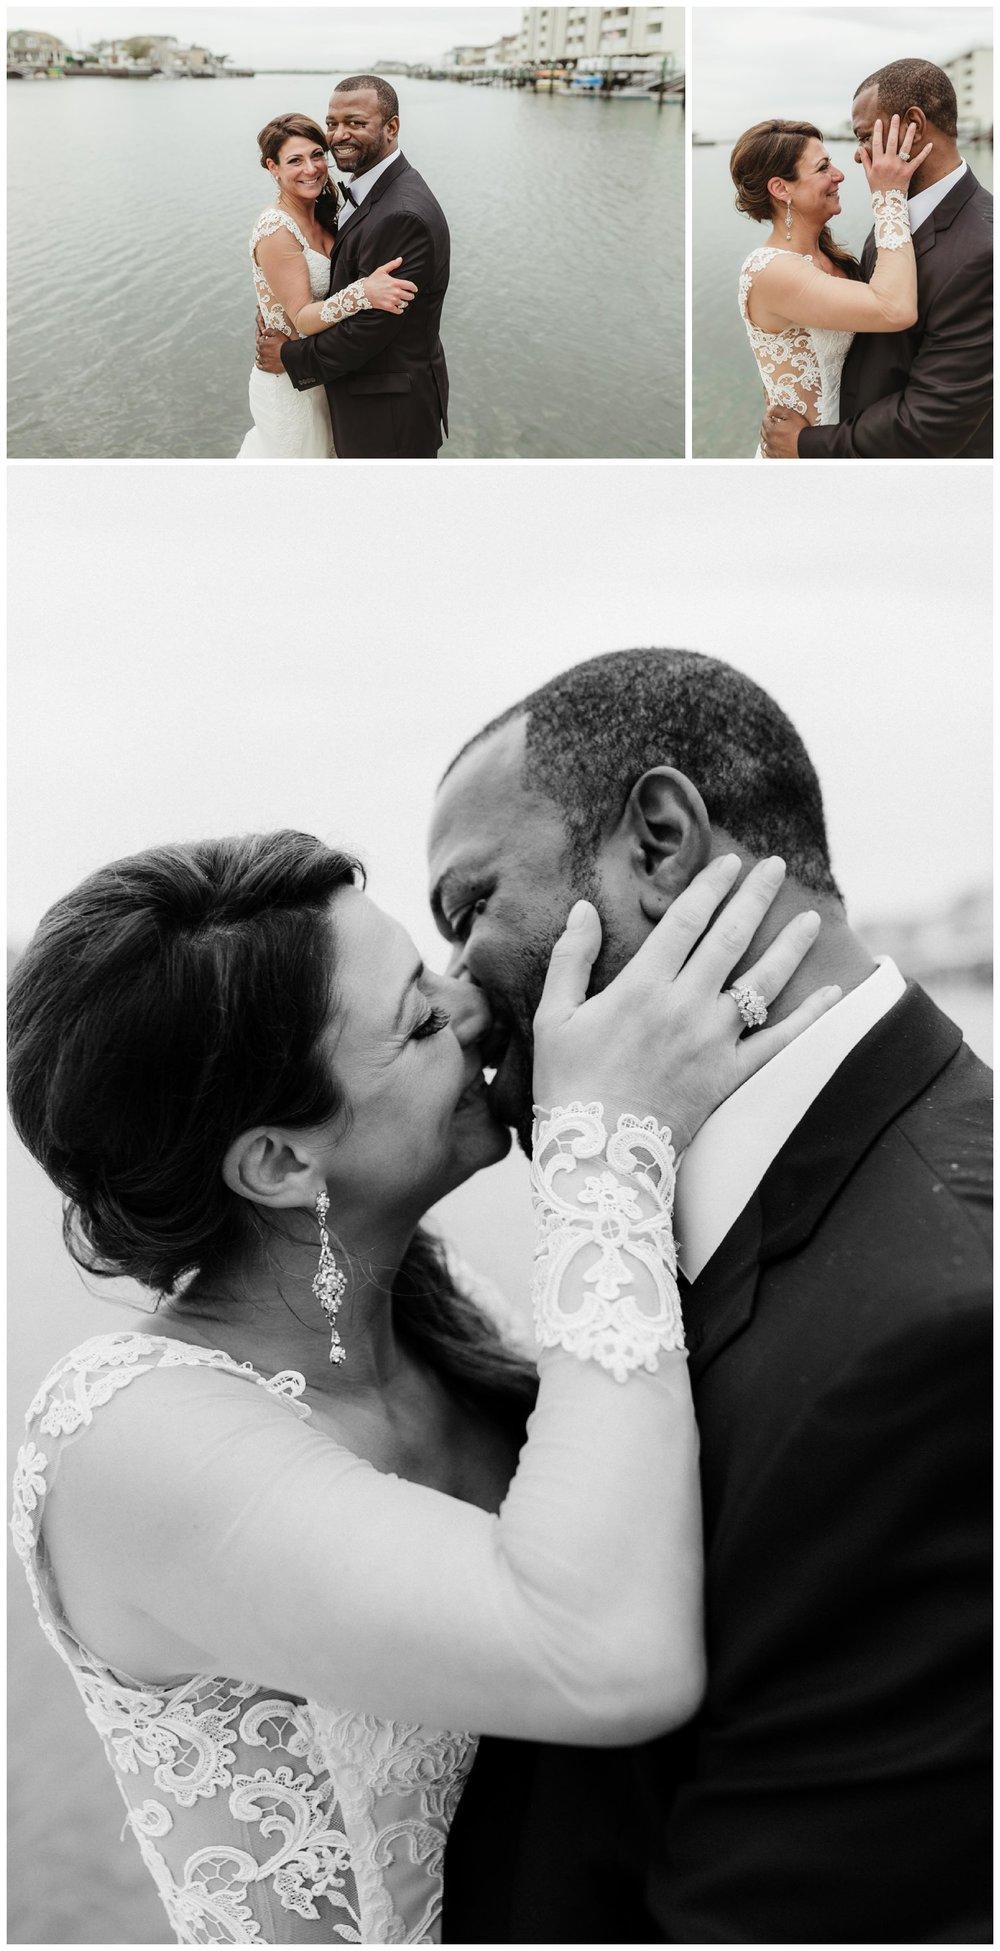 JillandLennon_TheReeds_ShelterHaven_StoneHarbor_NJ_NewJersey__SouthJersey_Wedding_Photographer_MagdalenaStudios_0324.jpg